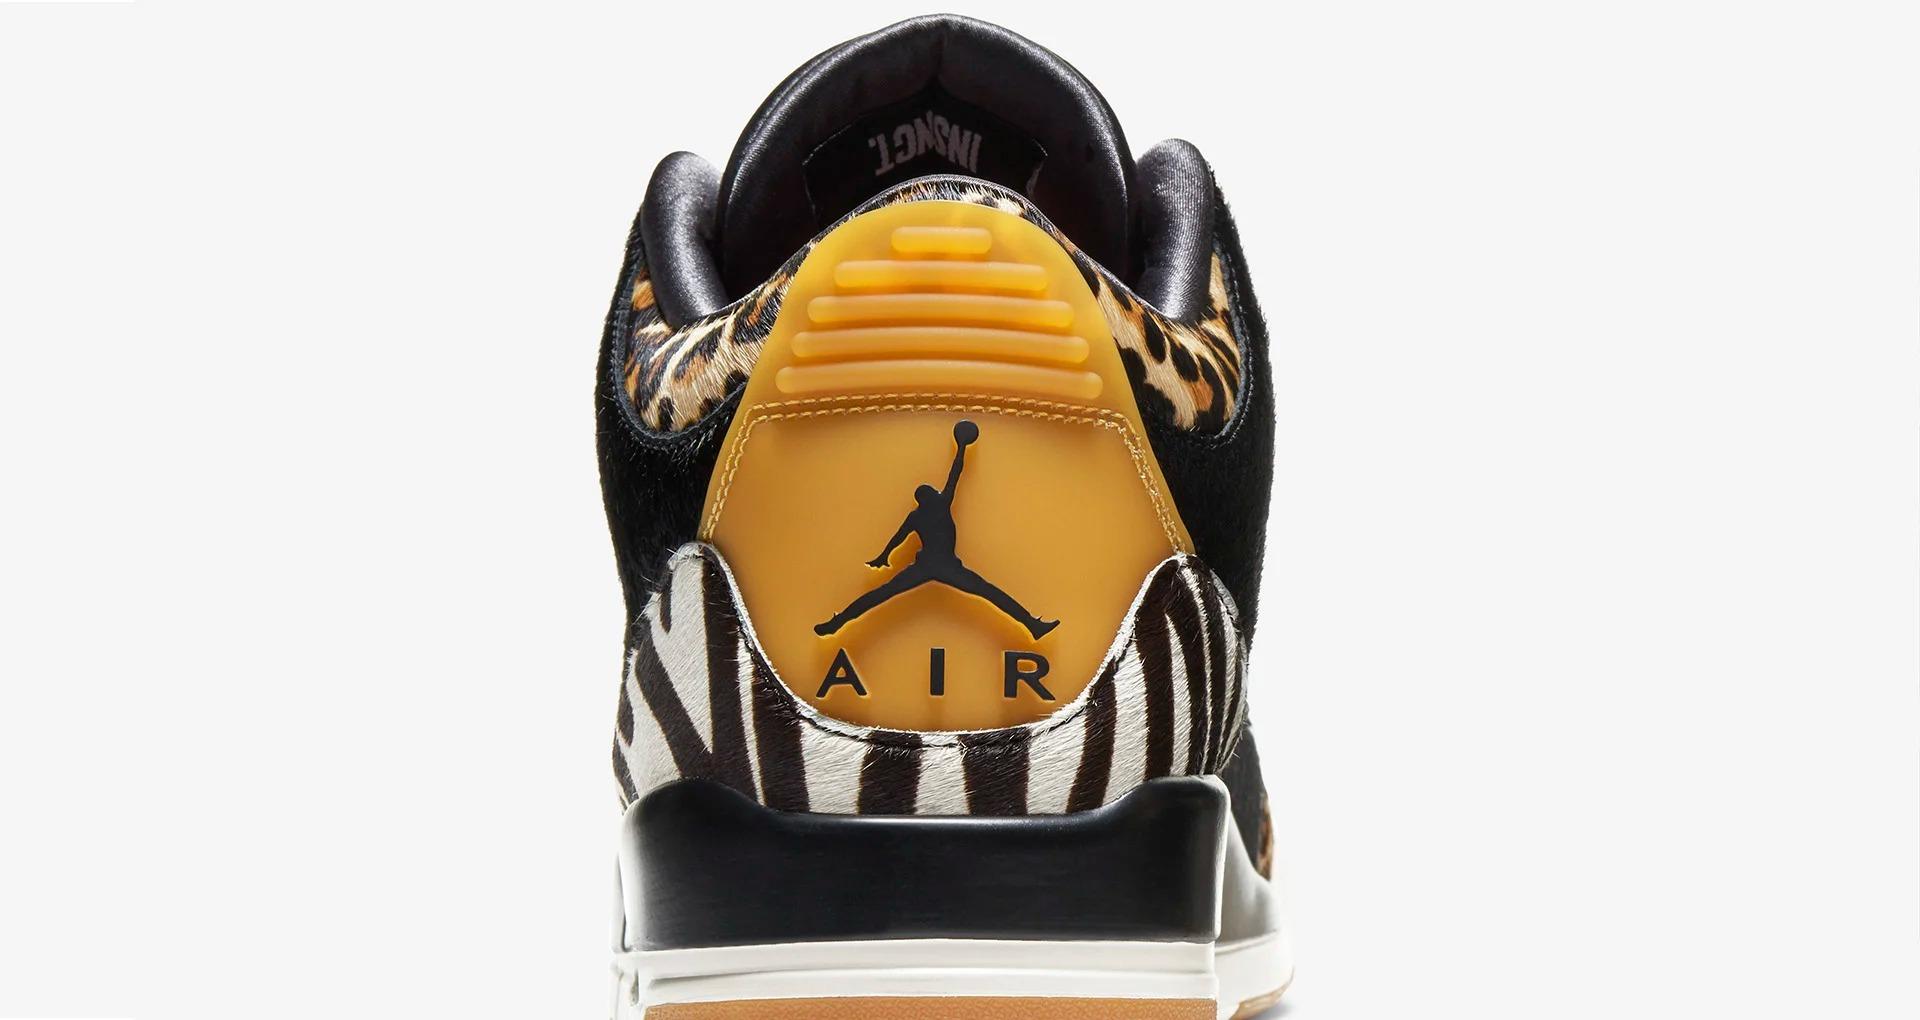 AJ3,Air Jordan 3,Animal Instin 4 种仿动物皮革拼接!「万兽之王」Air Jordan 3 本周发售!